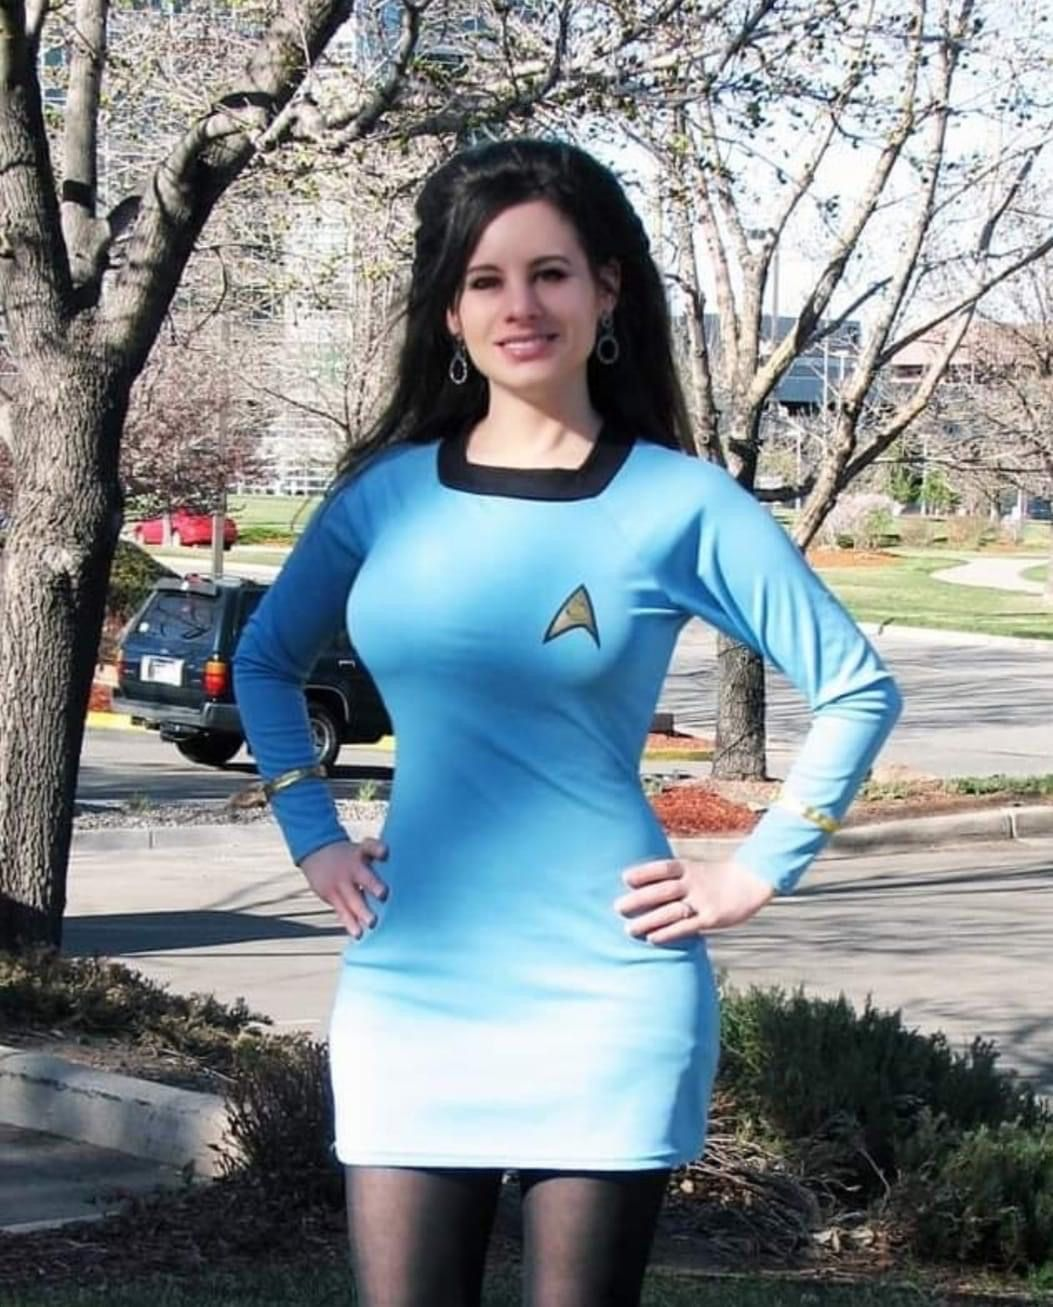 Pin by Da Jinx on Star Trek & Space girls in 2020 | Star